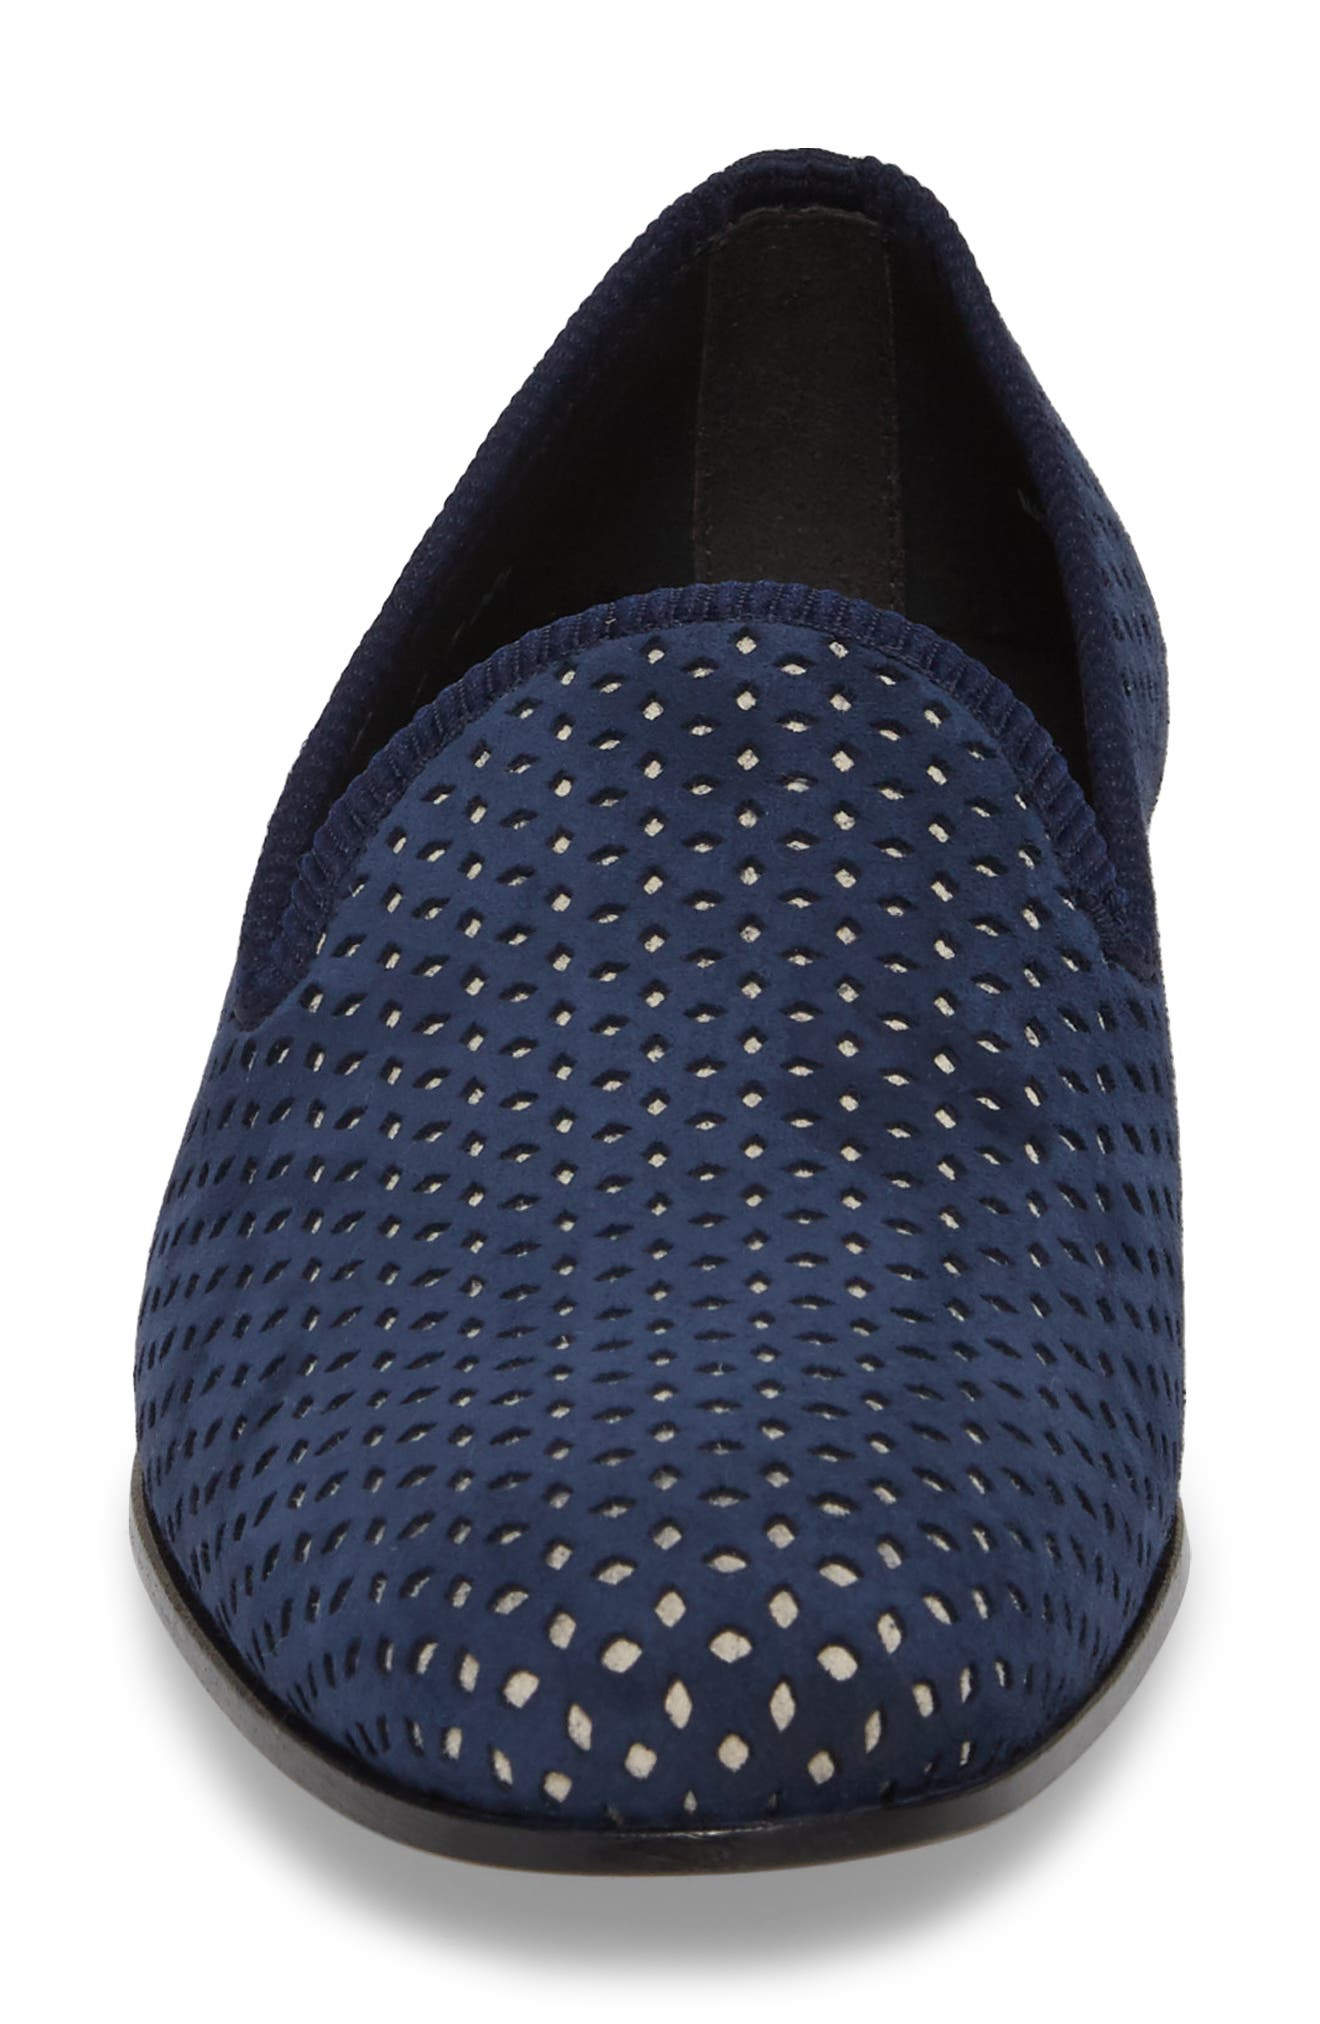 Cibeles Venetian Loafer,                             Alternate thumbnail 4, color,                             Blue/ Bone Suede